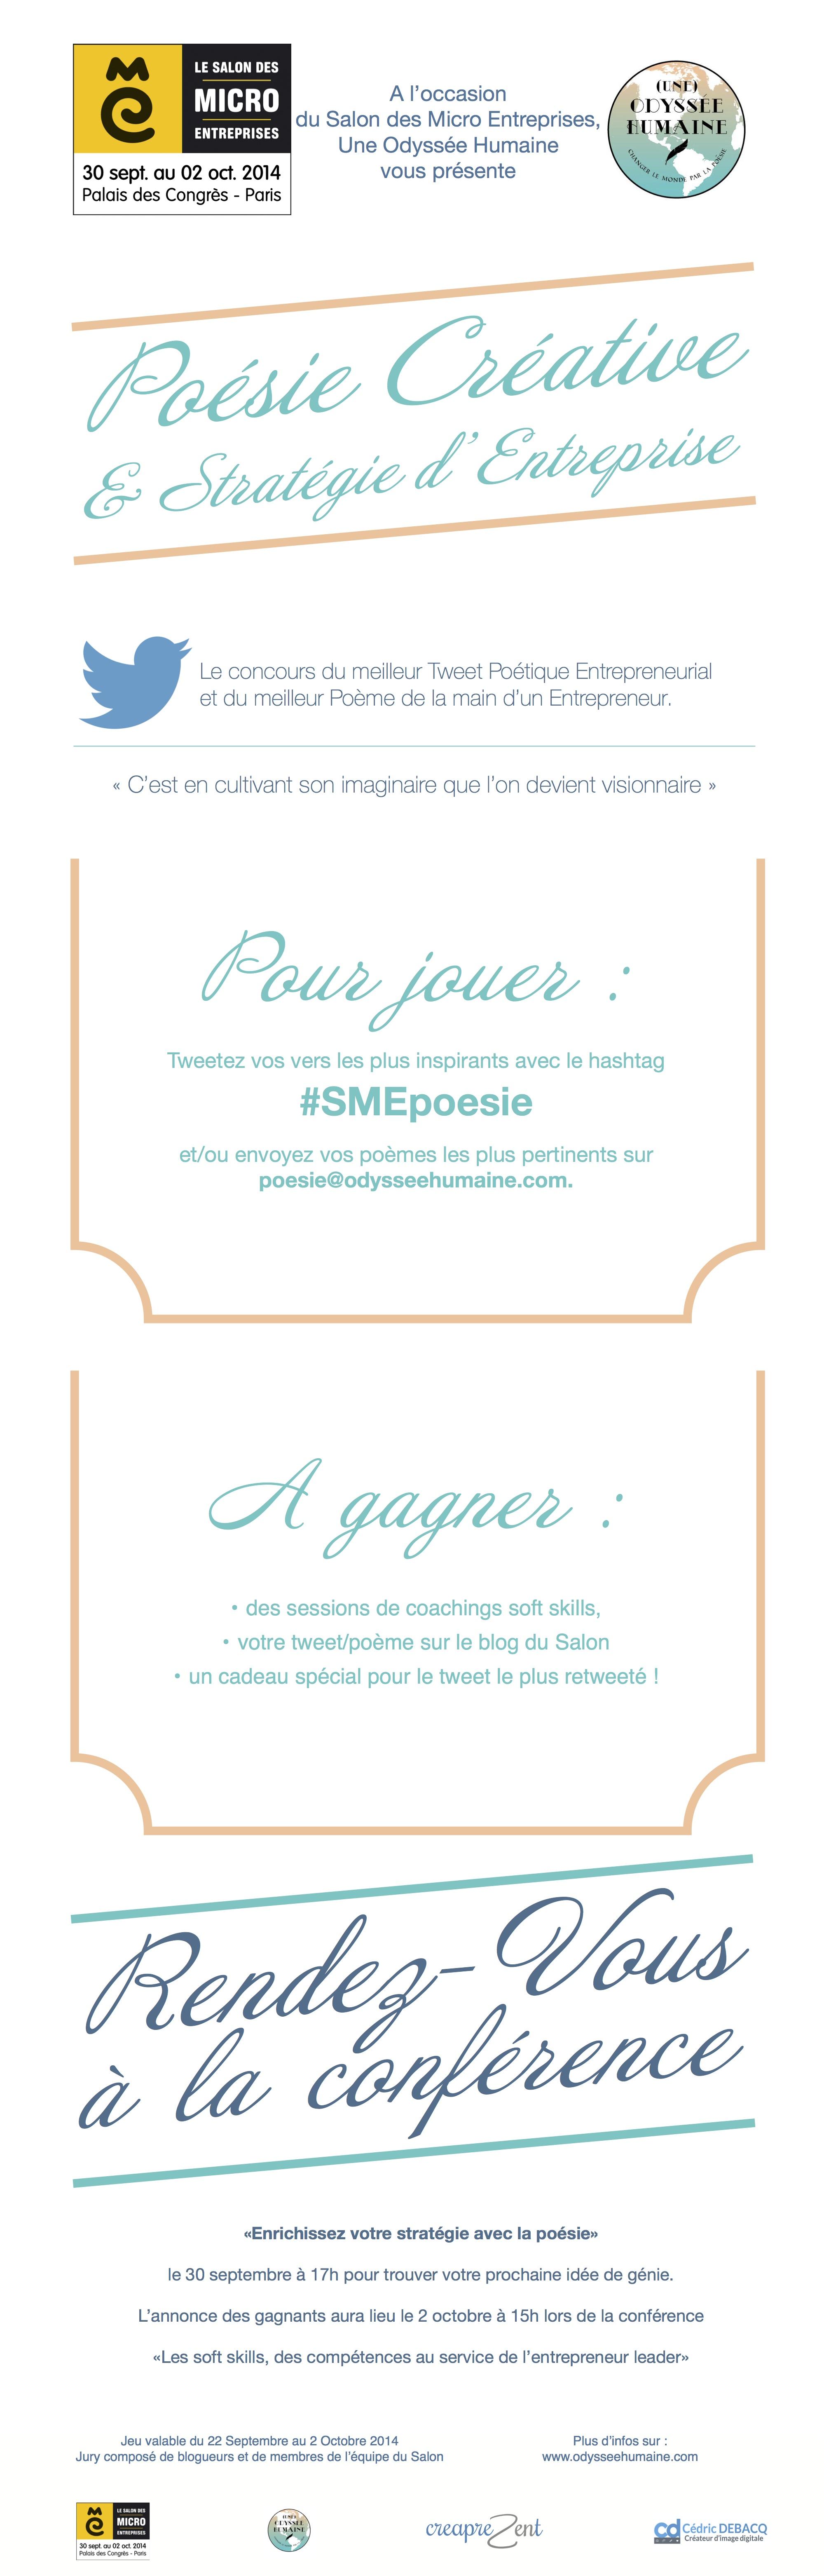 infographie-poesiecreative